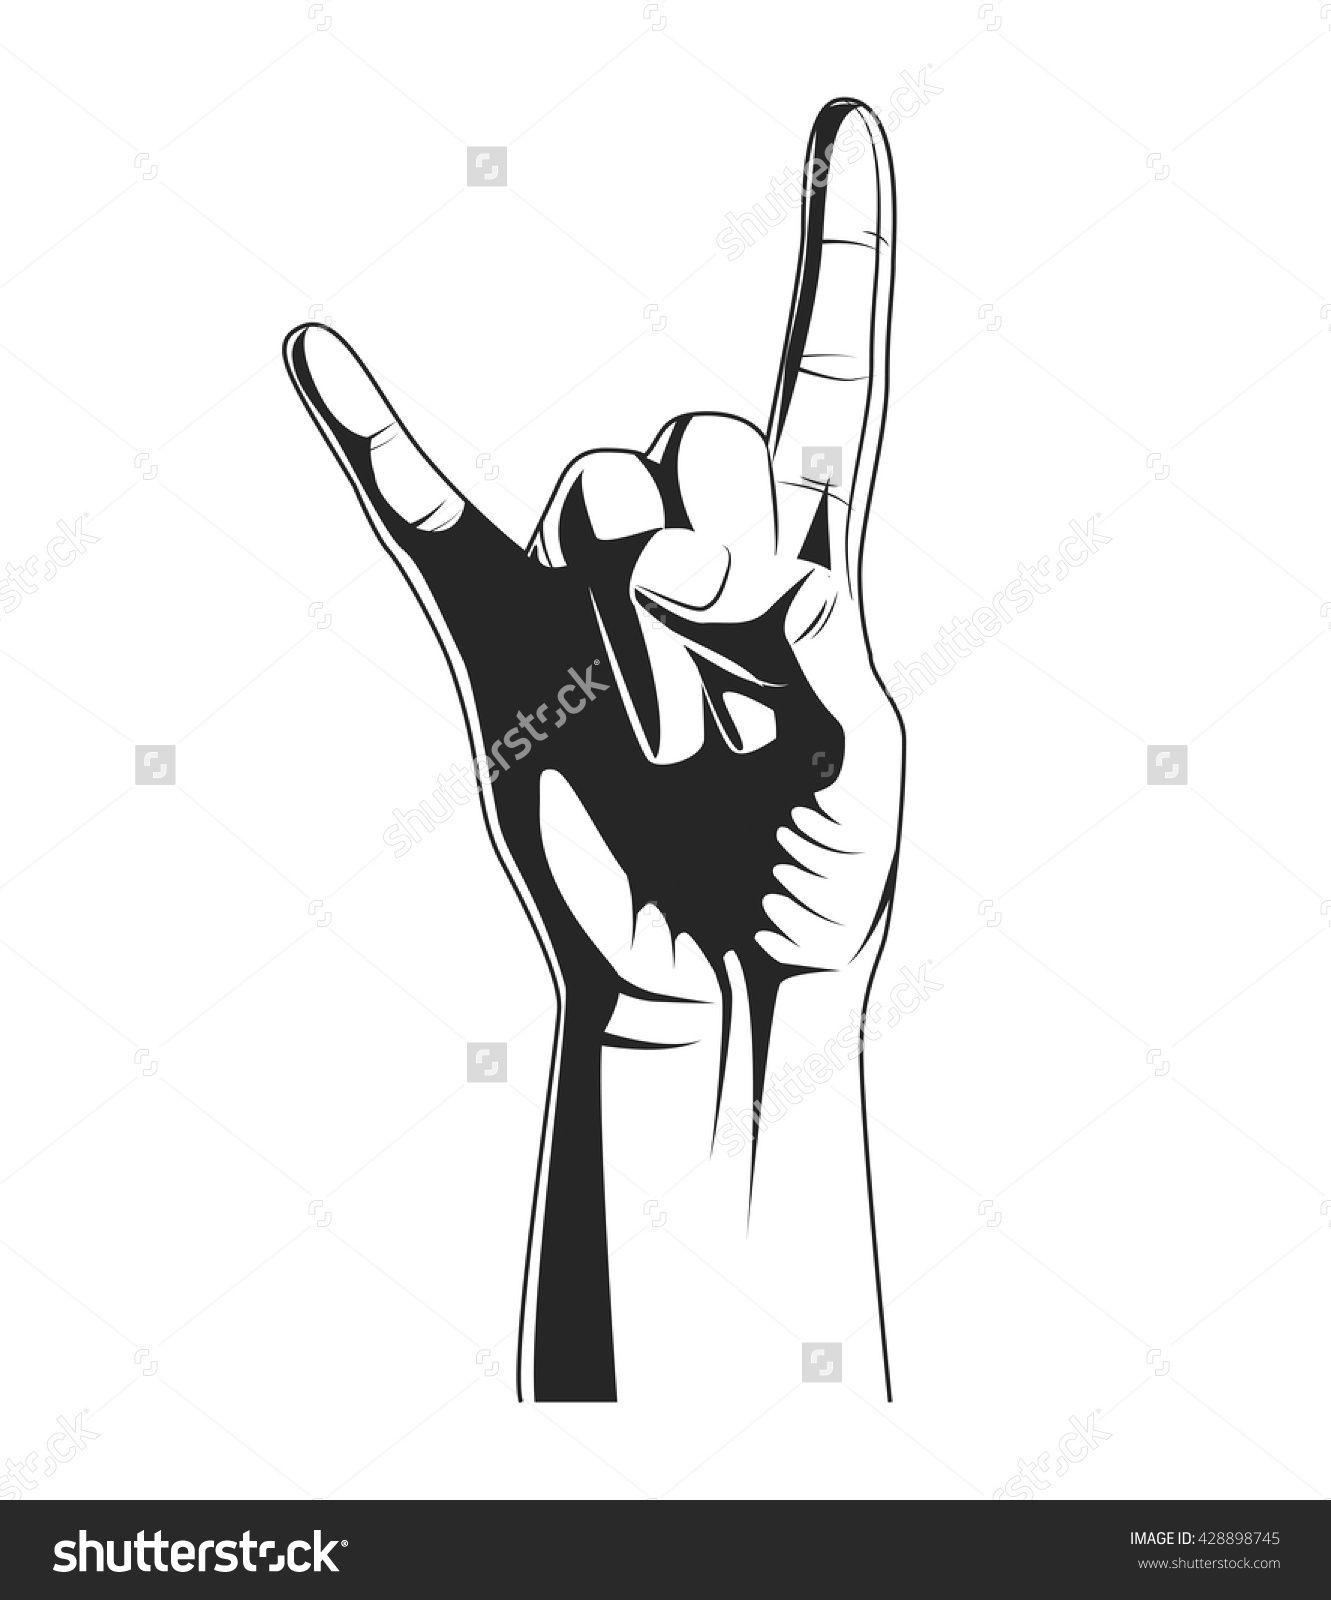 Hand in rock rock festival poster silhouette of hand of rocker hand in rock rock festival poster silhouette of hand of rocker for poster buycottarizona